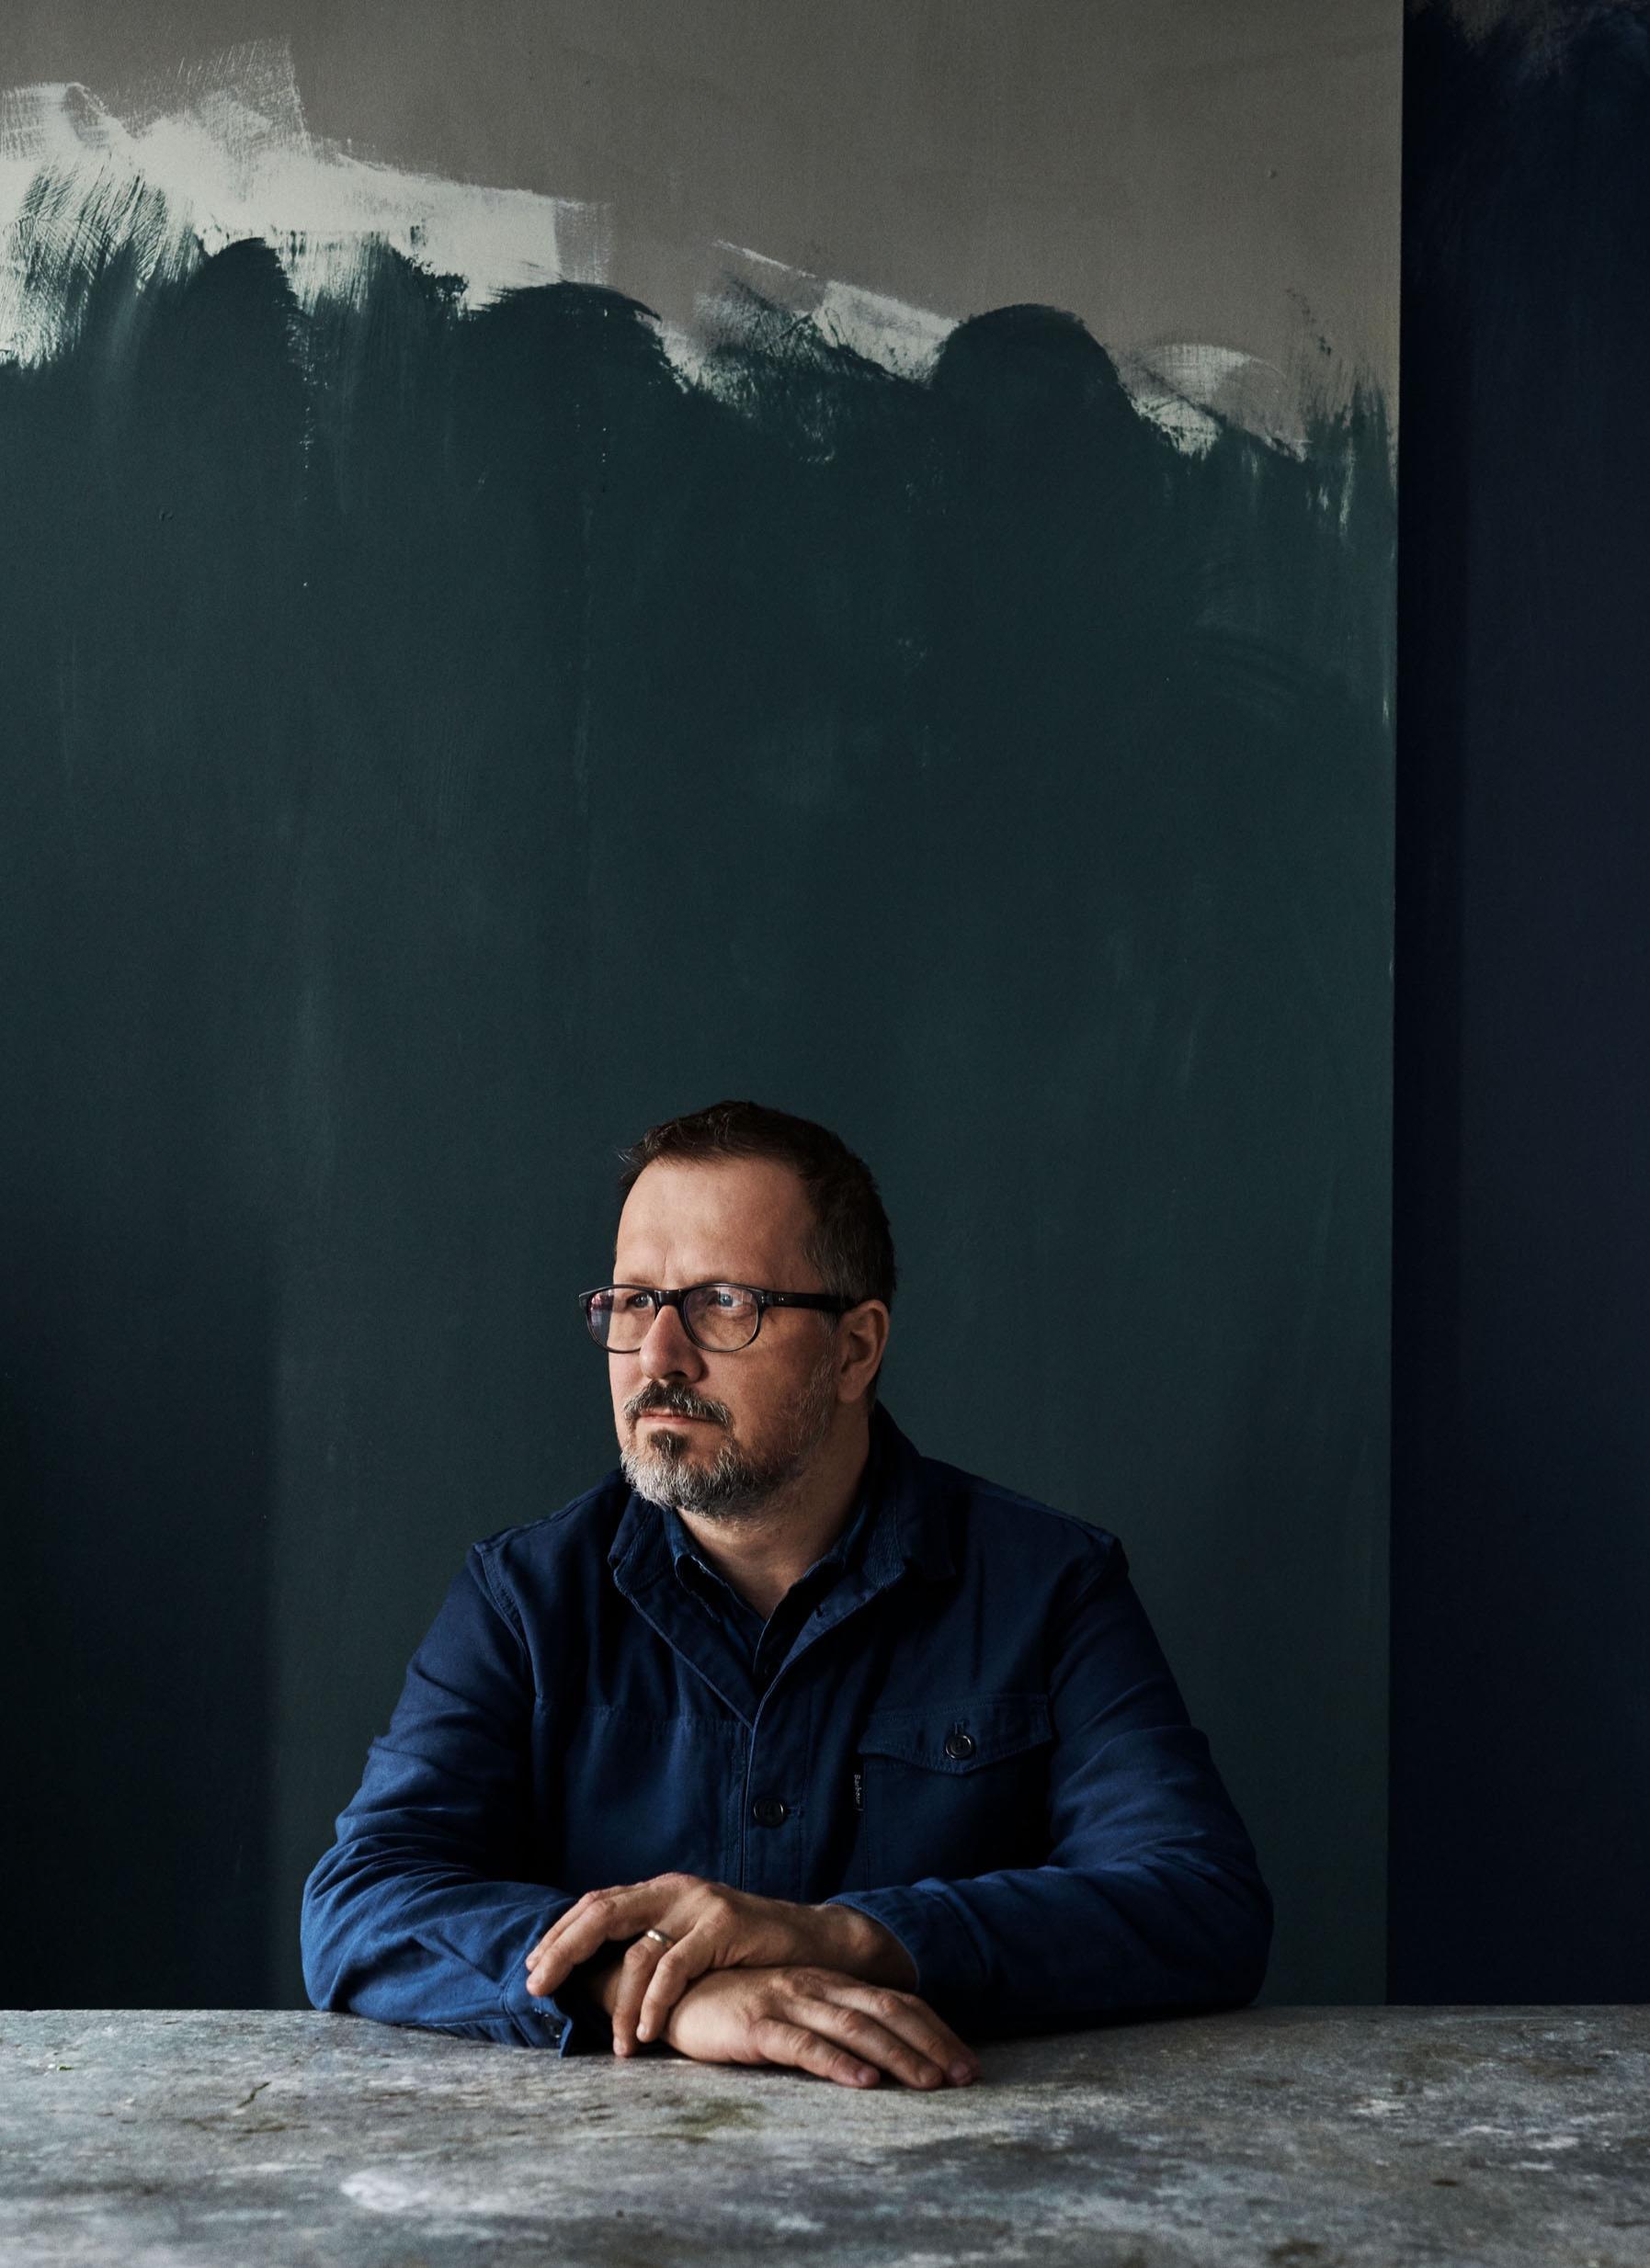 högtid - Roland persson / skarp photography